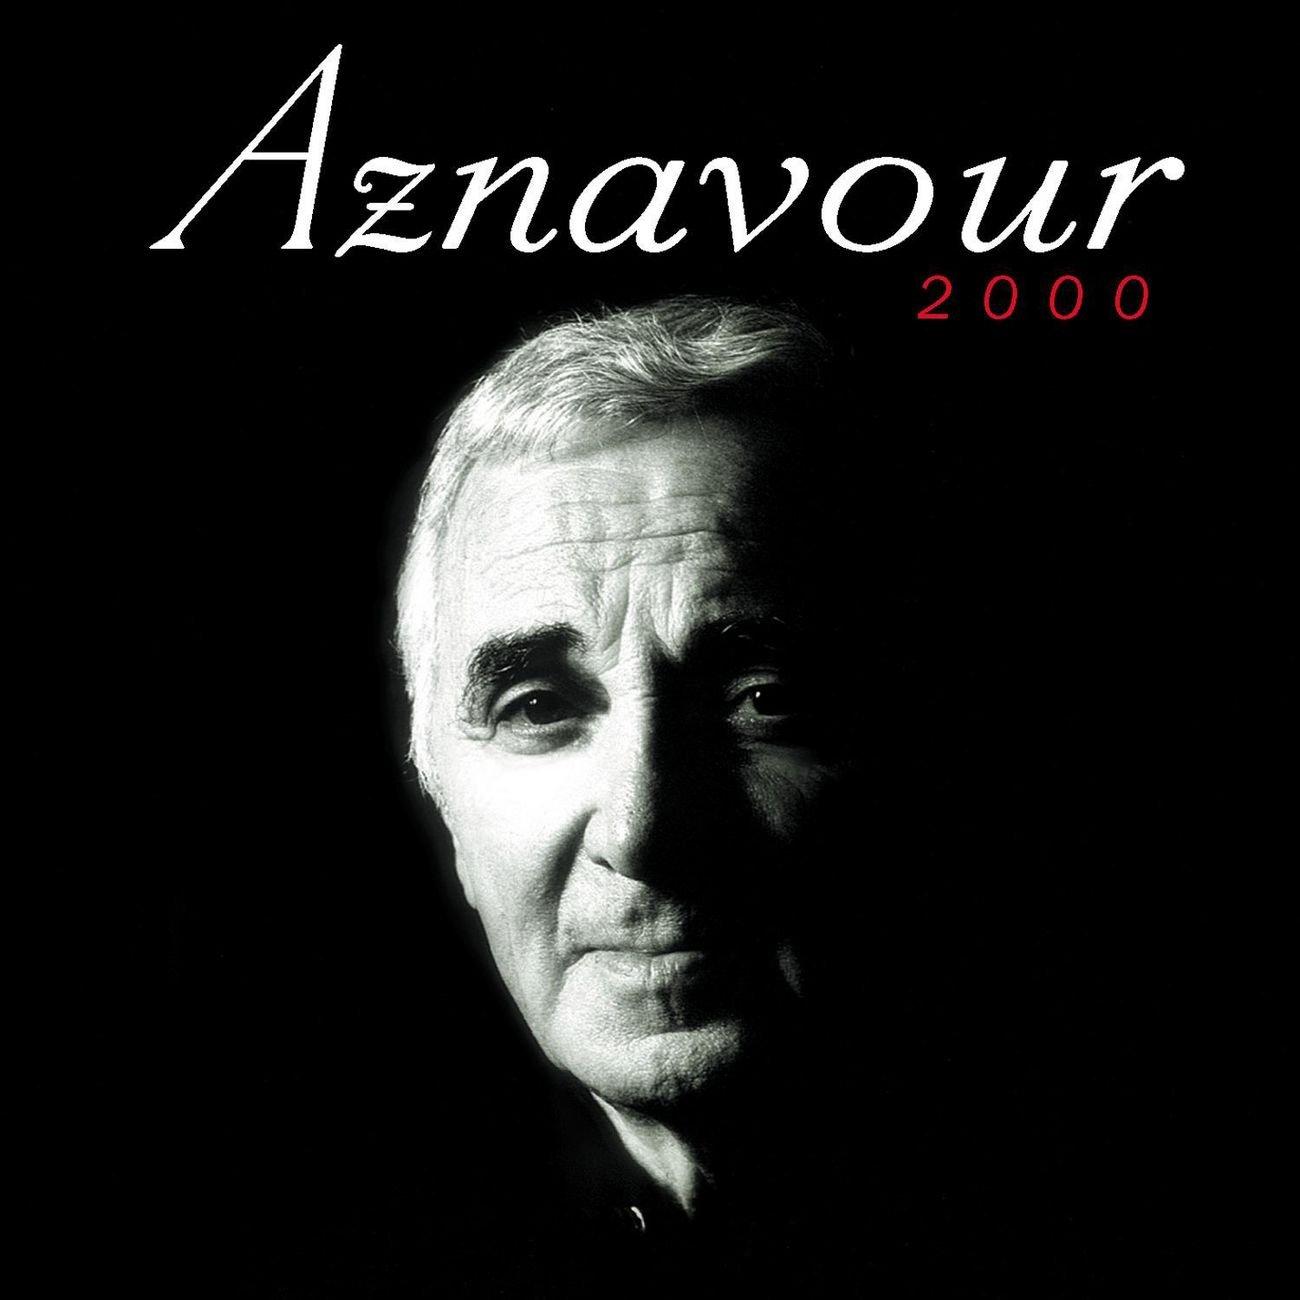 AZNAVOUR, CHARLES - Aznavour 2000 - Amazon.com Music